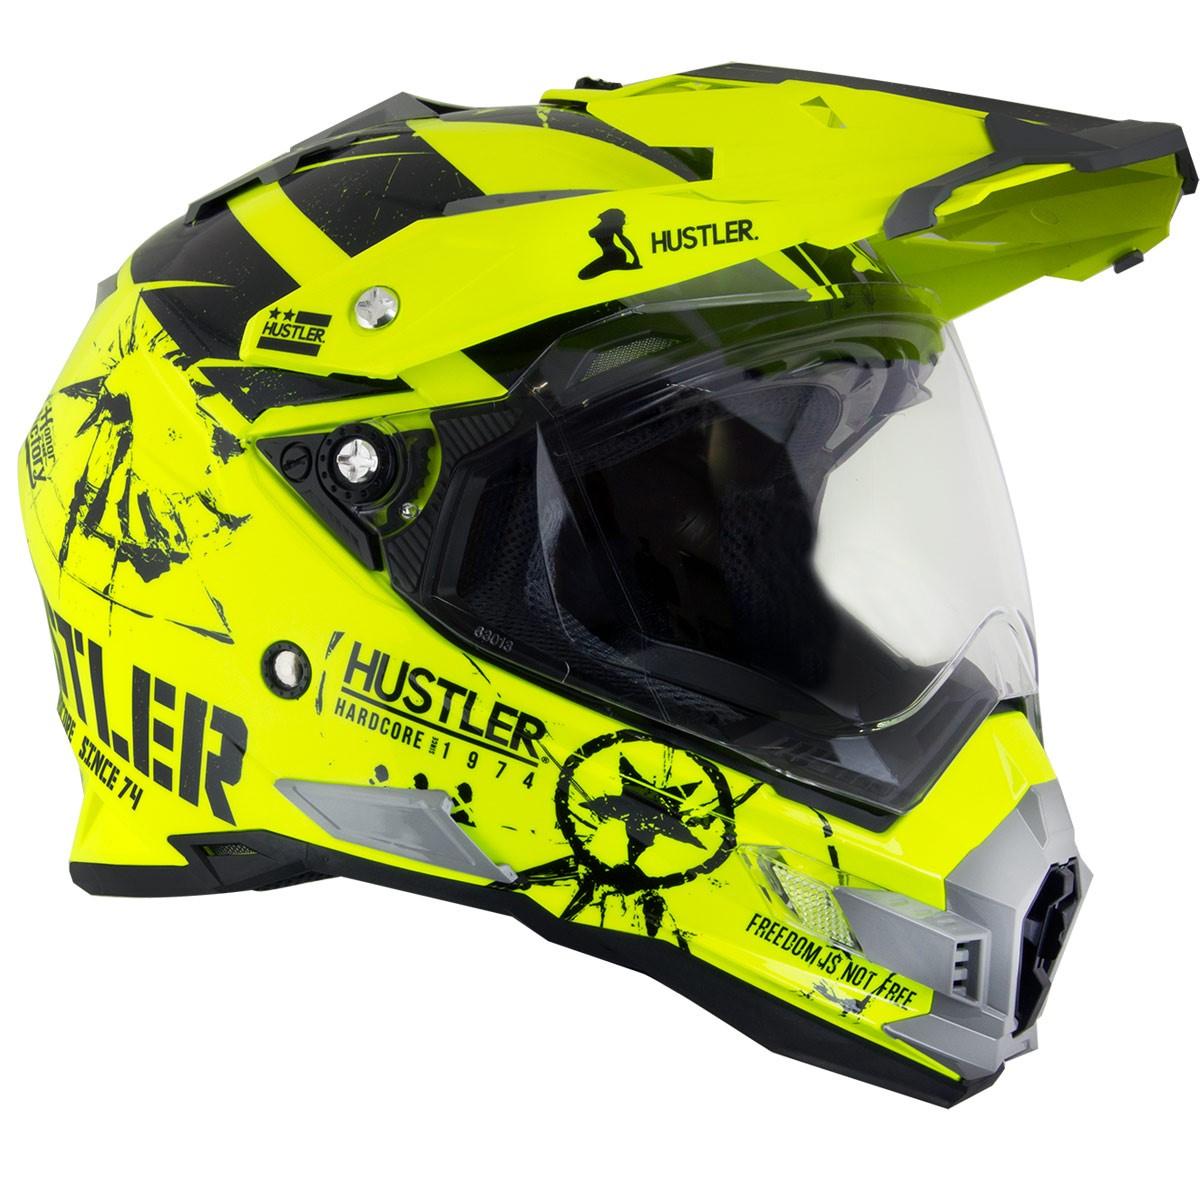 Hustler Hardcore Since 1974 Dual Sport High-Viz Neon Motorcycle Helmet